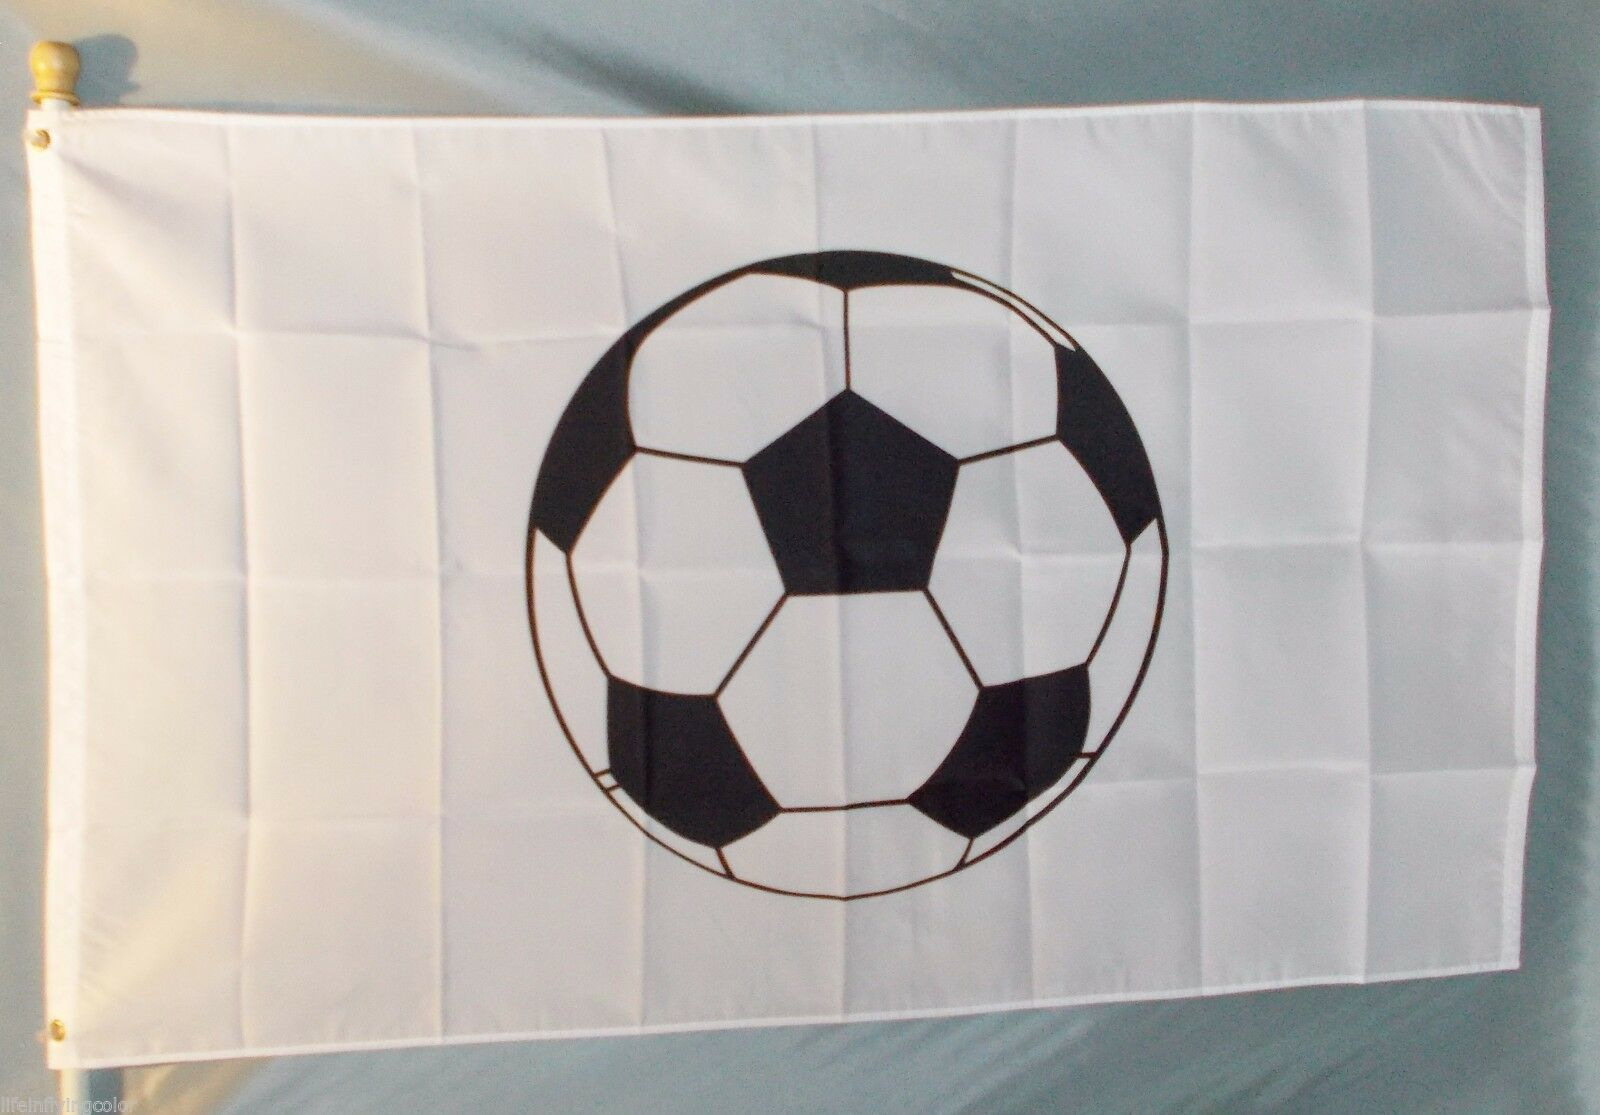 SOCCER BALL 3X5' FLAG BIG NEW 3'X5' FUTBOL FOOTBALL Fall Sports